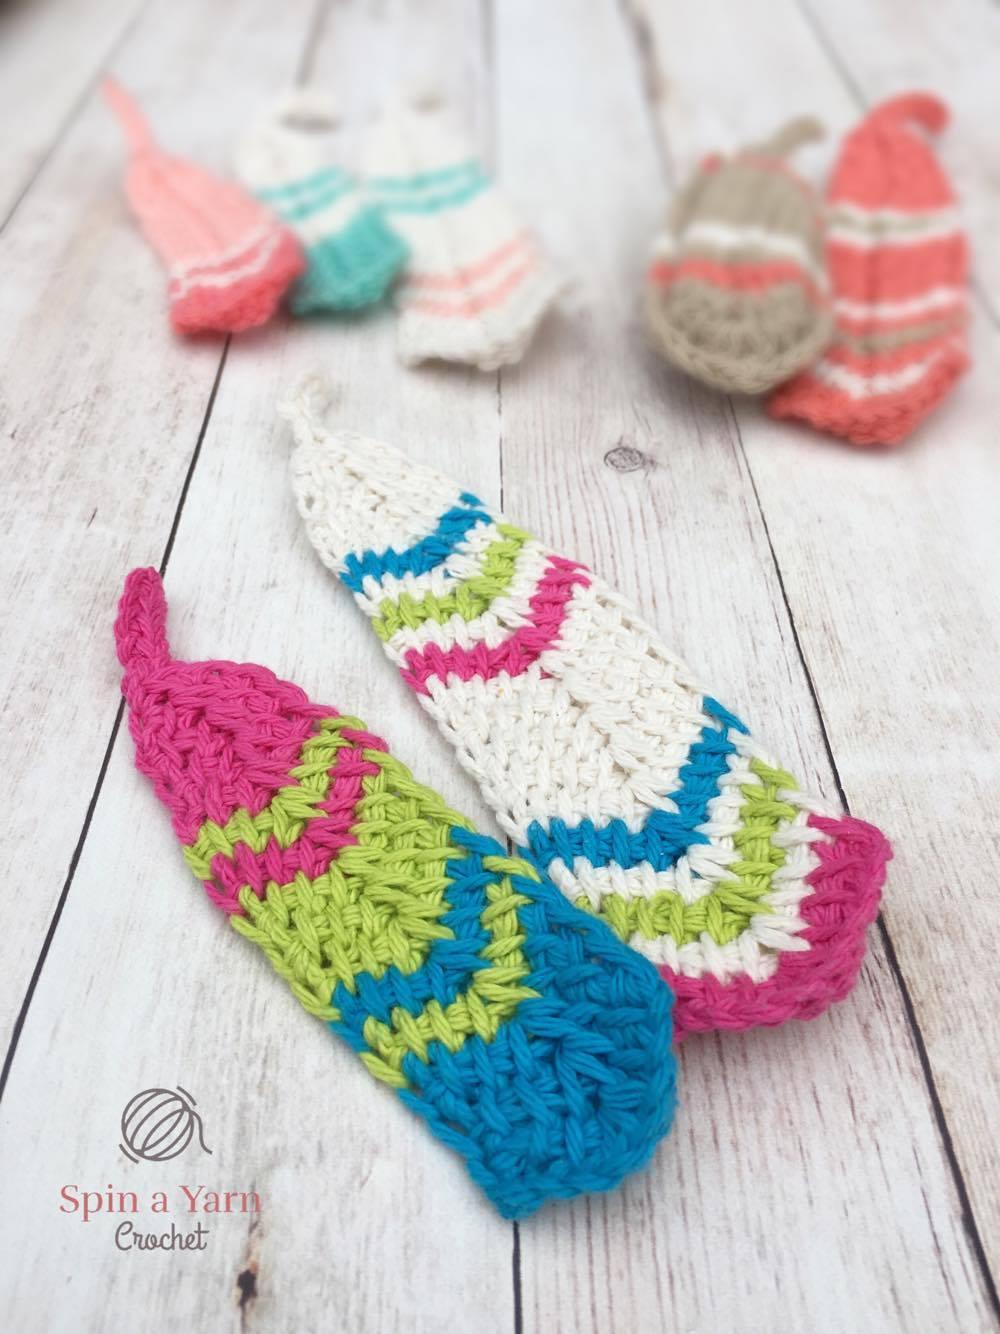 Tunisian Feathers Spin A Yarn Crochet